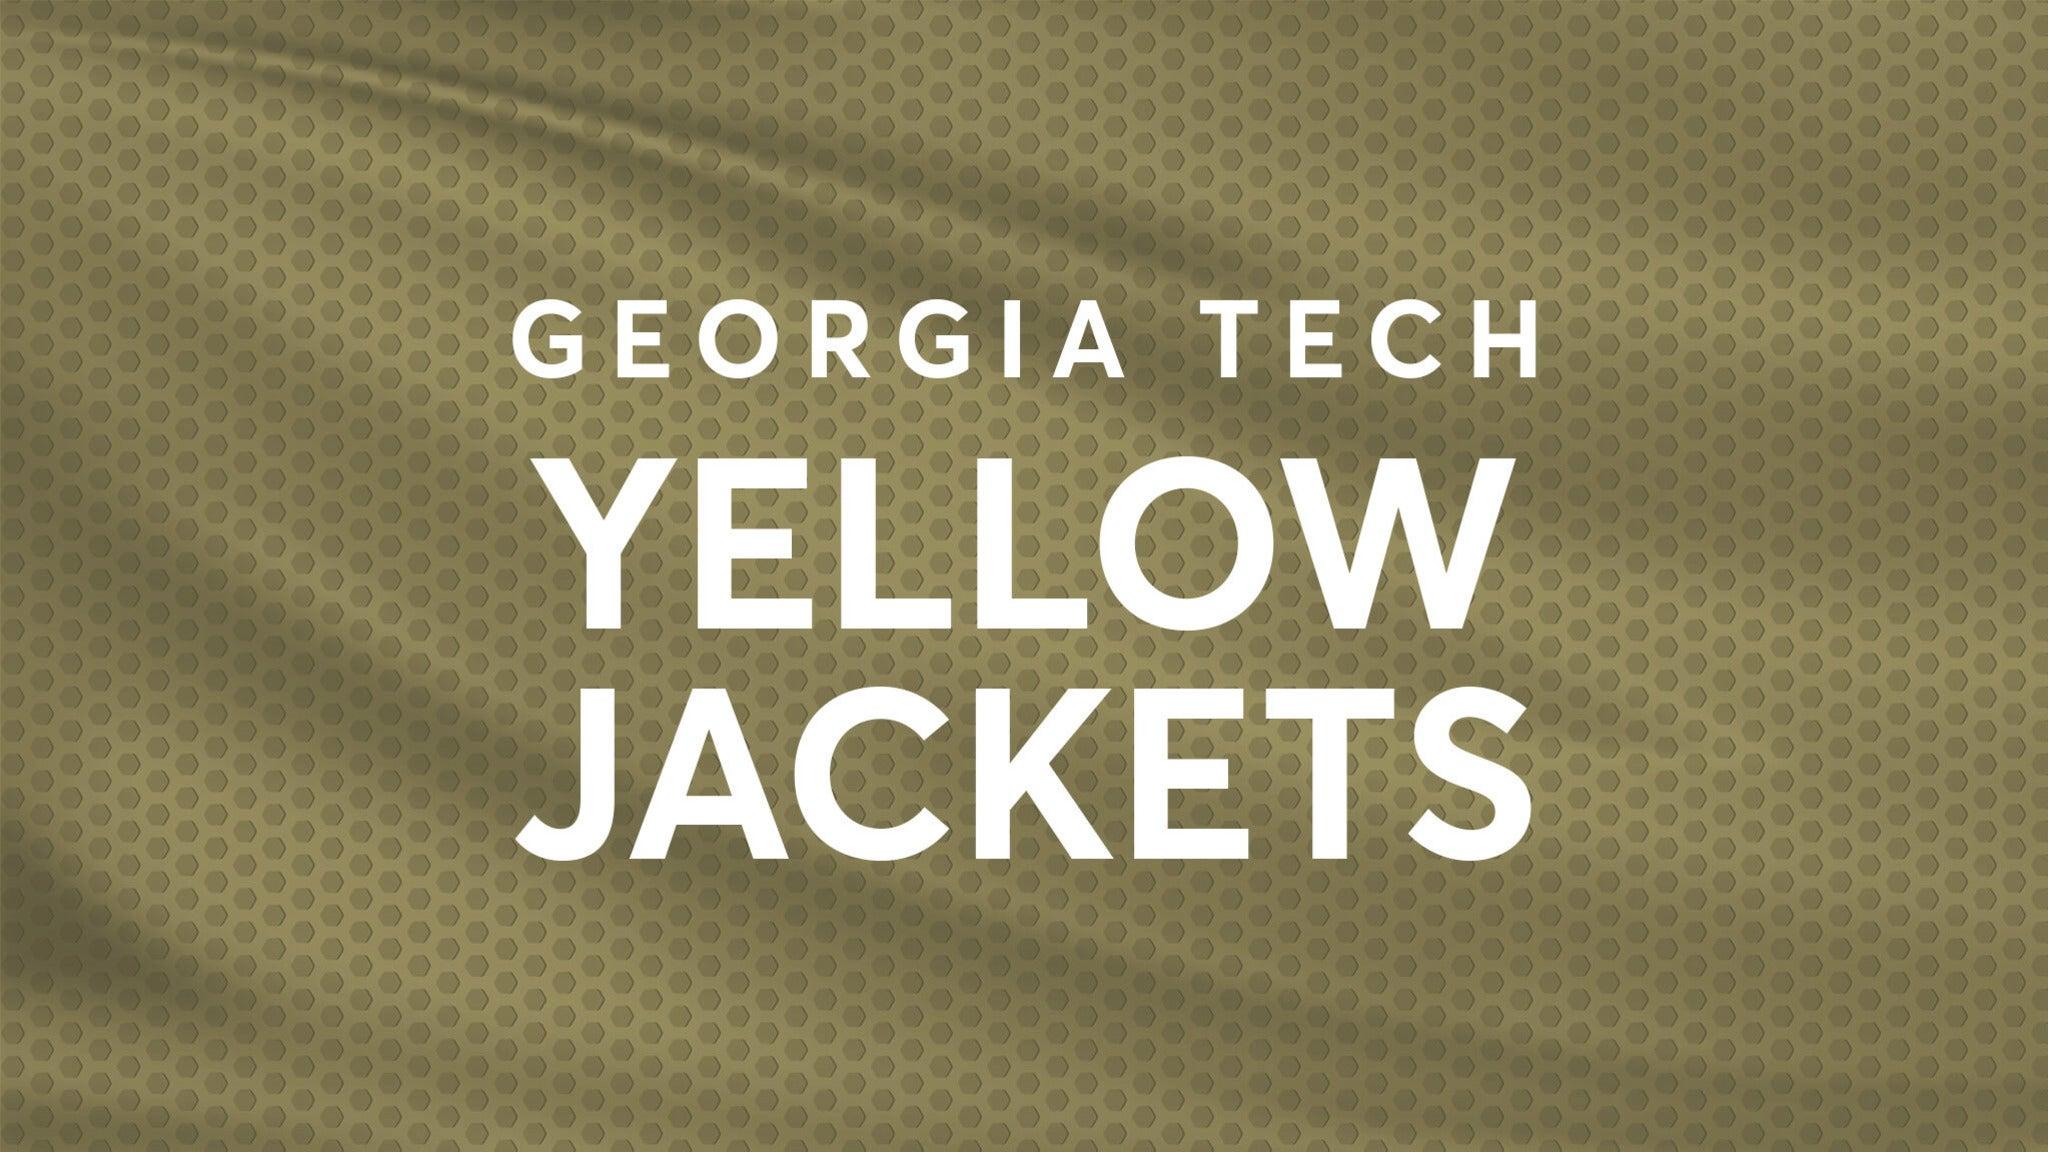 Georgia Tech Yellow Jackets Football